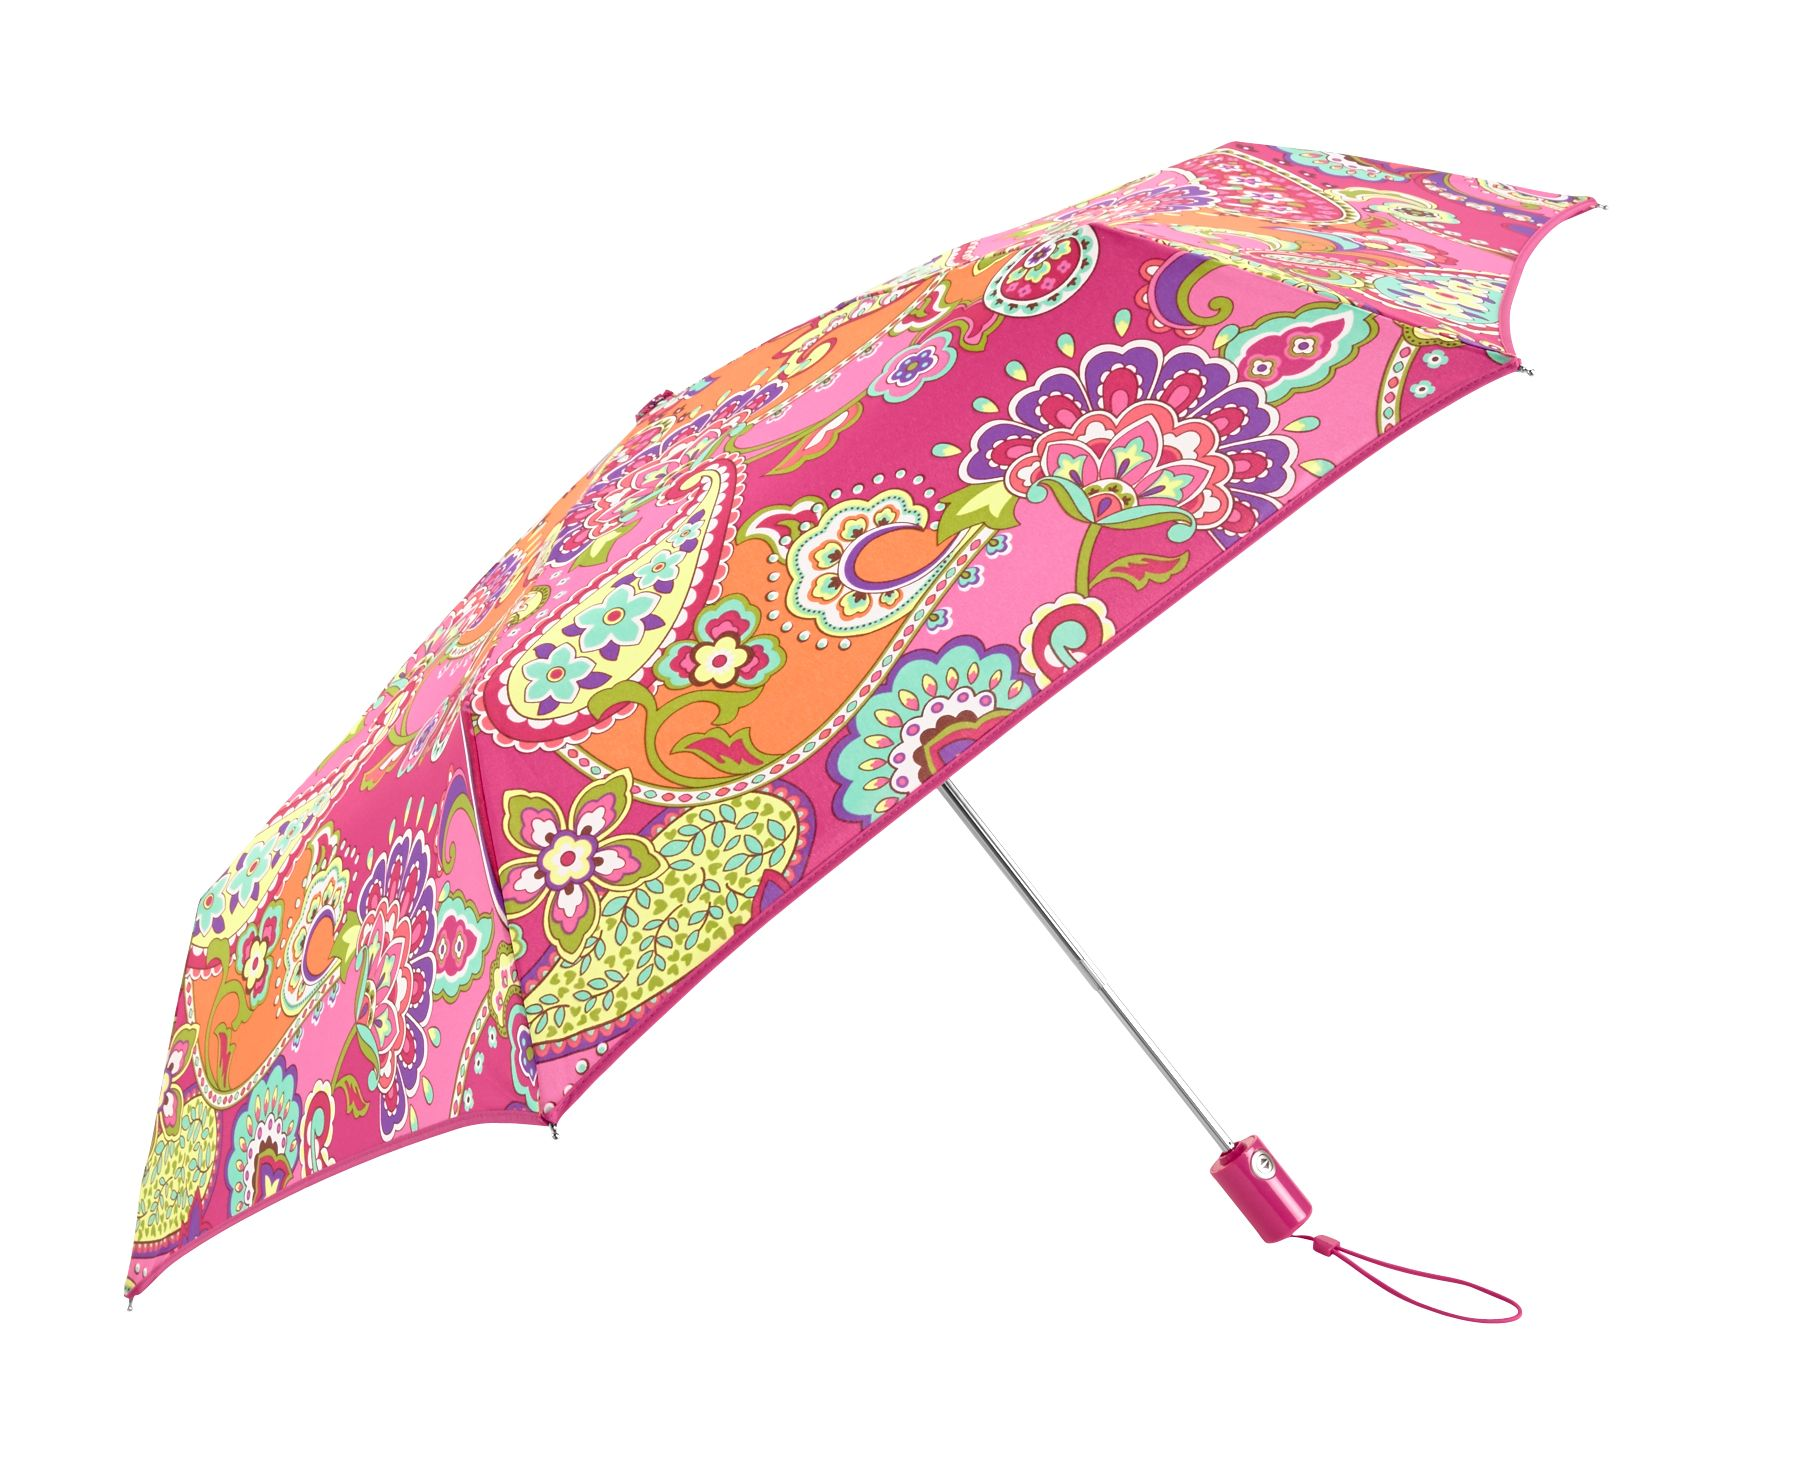 Vera Bradley Umbrella in Pink Swirls